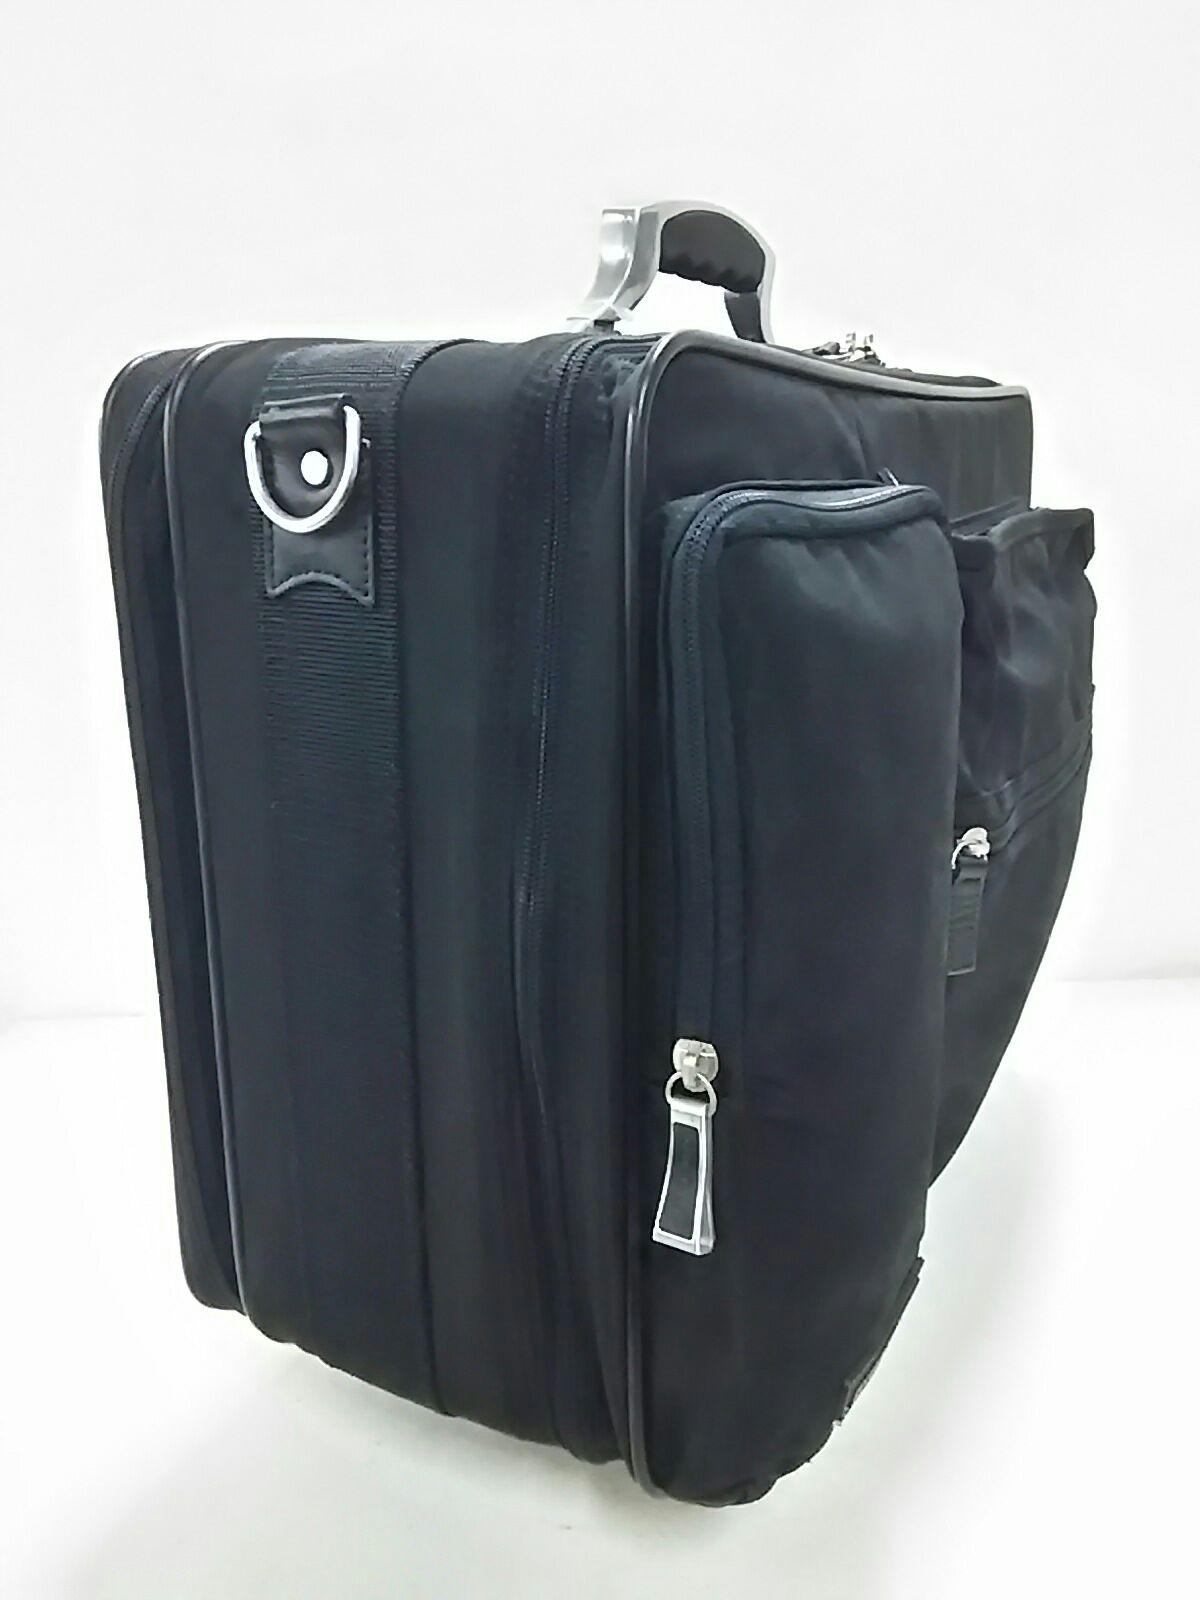 TAKEOKIKUCHI(タケオキクチ)のキャリーバッグ